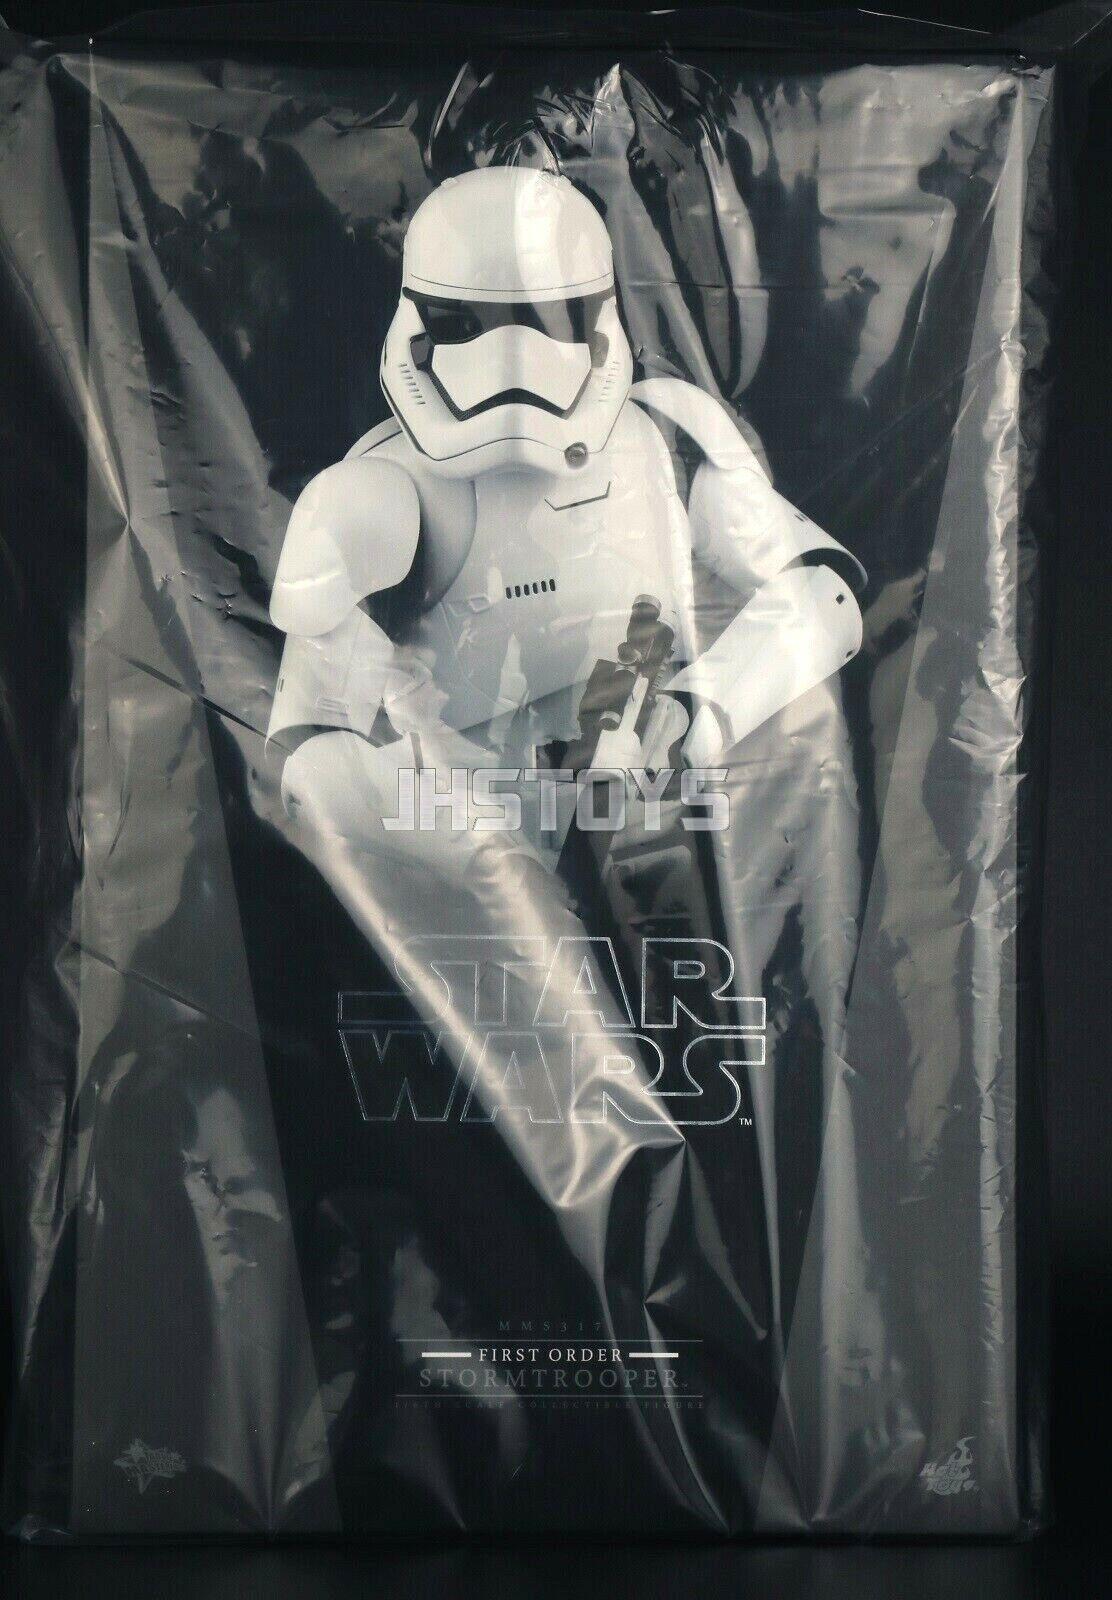 Caliente giocattoli 1 6 estrella guerras EP  VII The Force Awakens Stormtrooper MMS317  negozio outlet